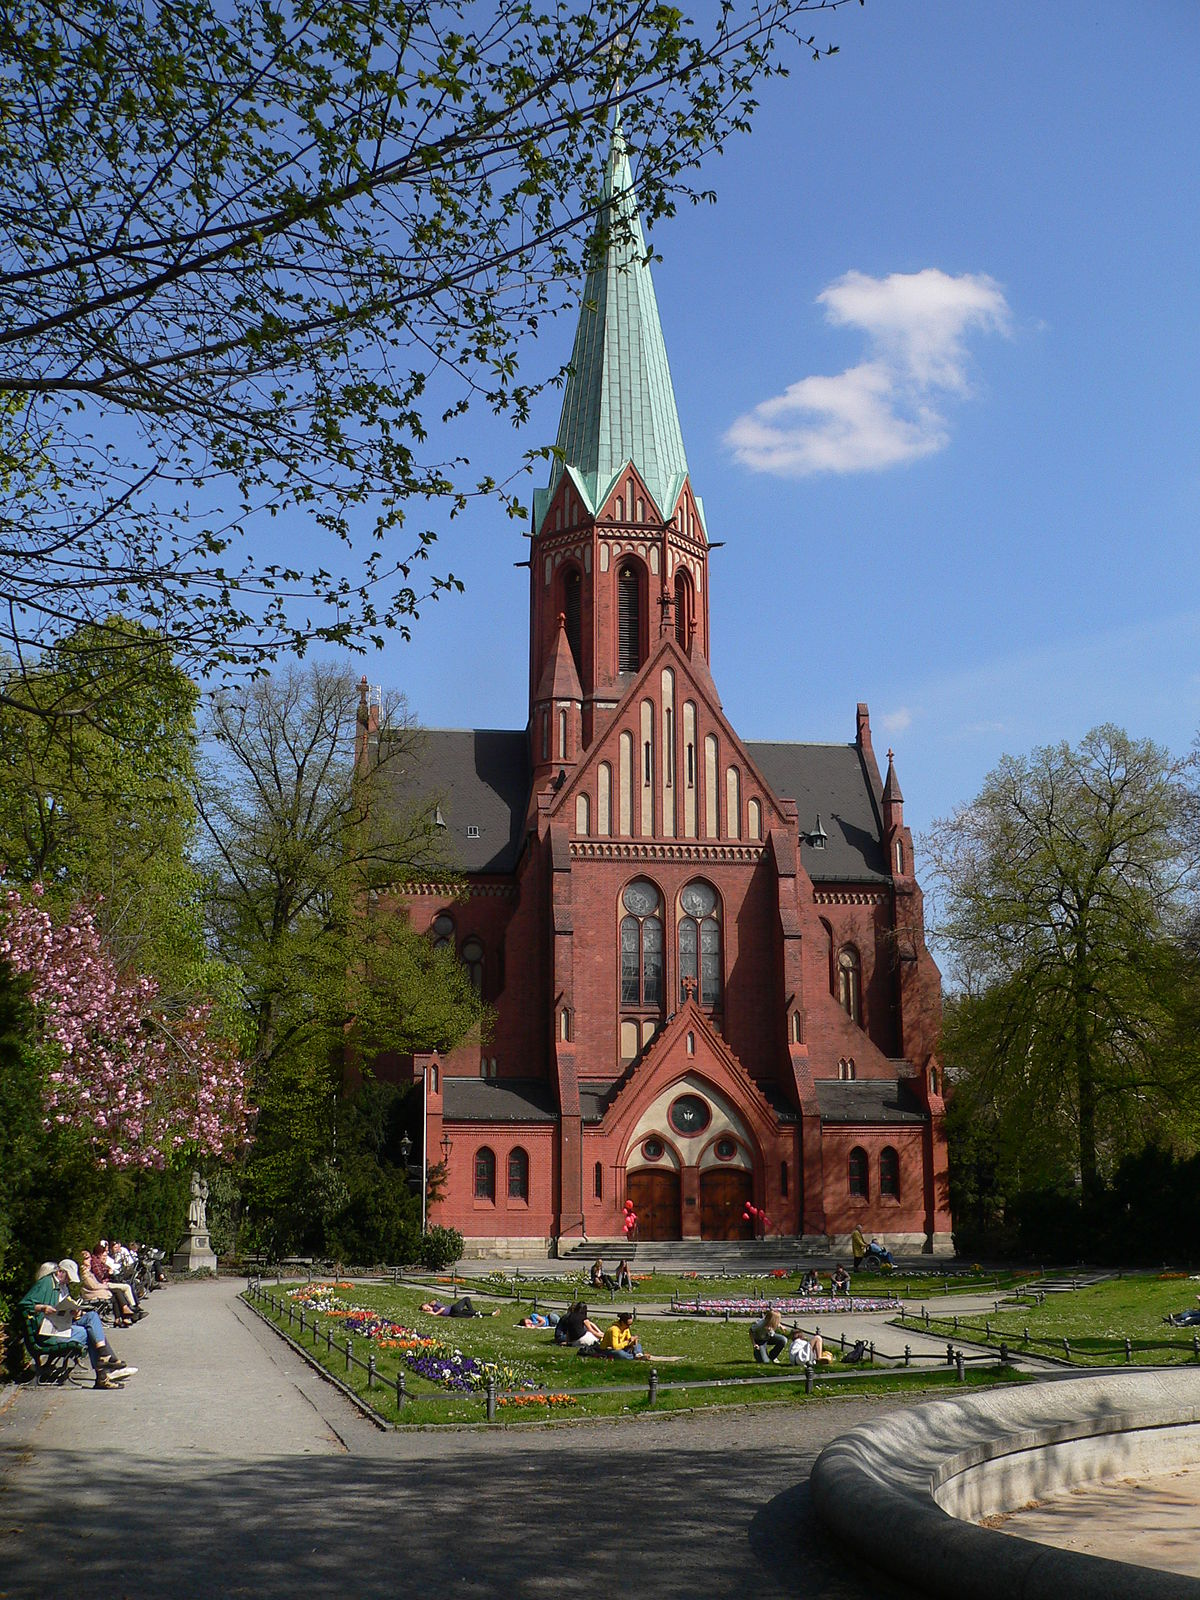 Sint lodewijkskerk berlijn wikipedia for Interieur 51 berlin